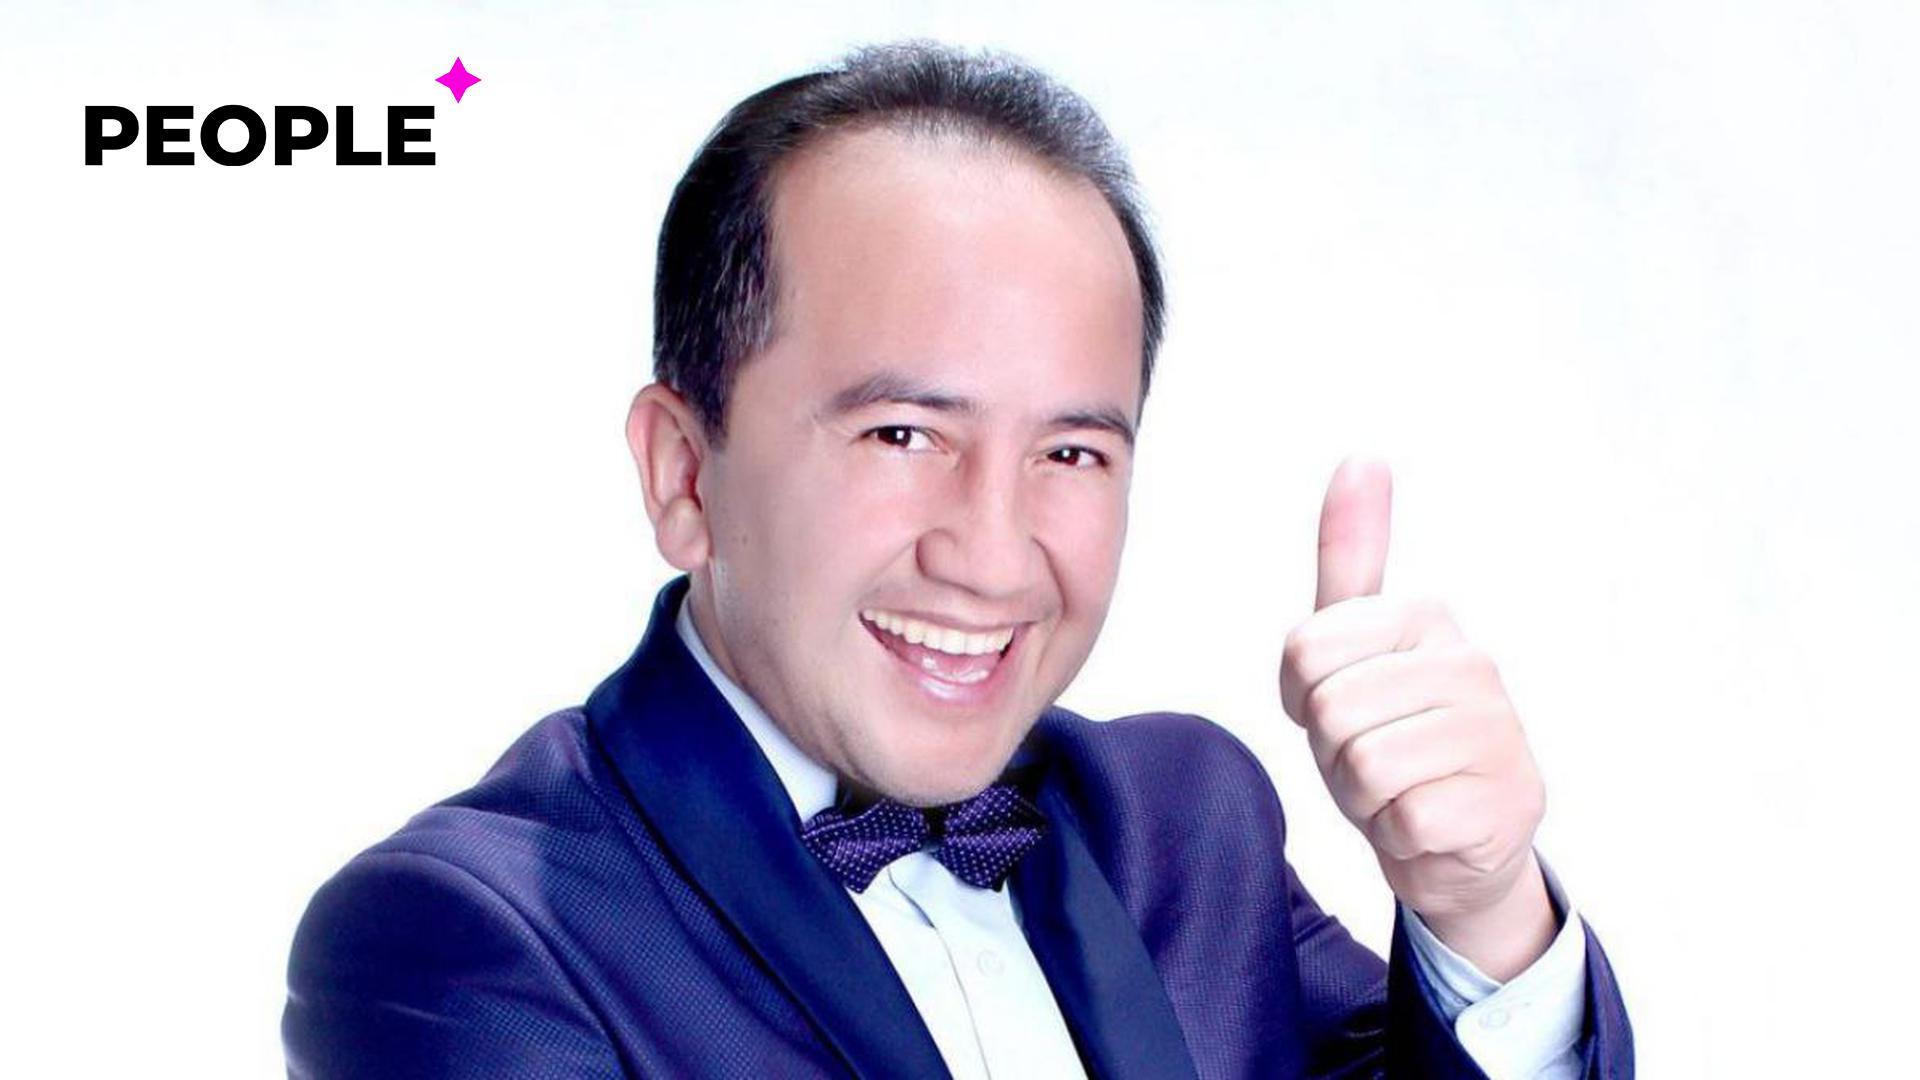 Юморист Валижон Шамшиев стал директором одной из школ Ташкента